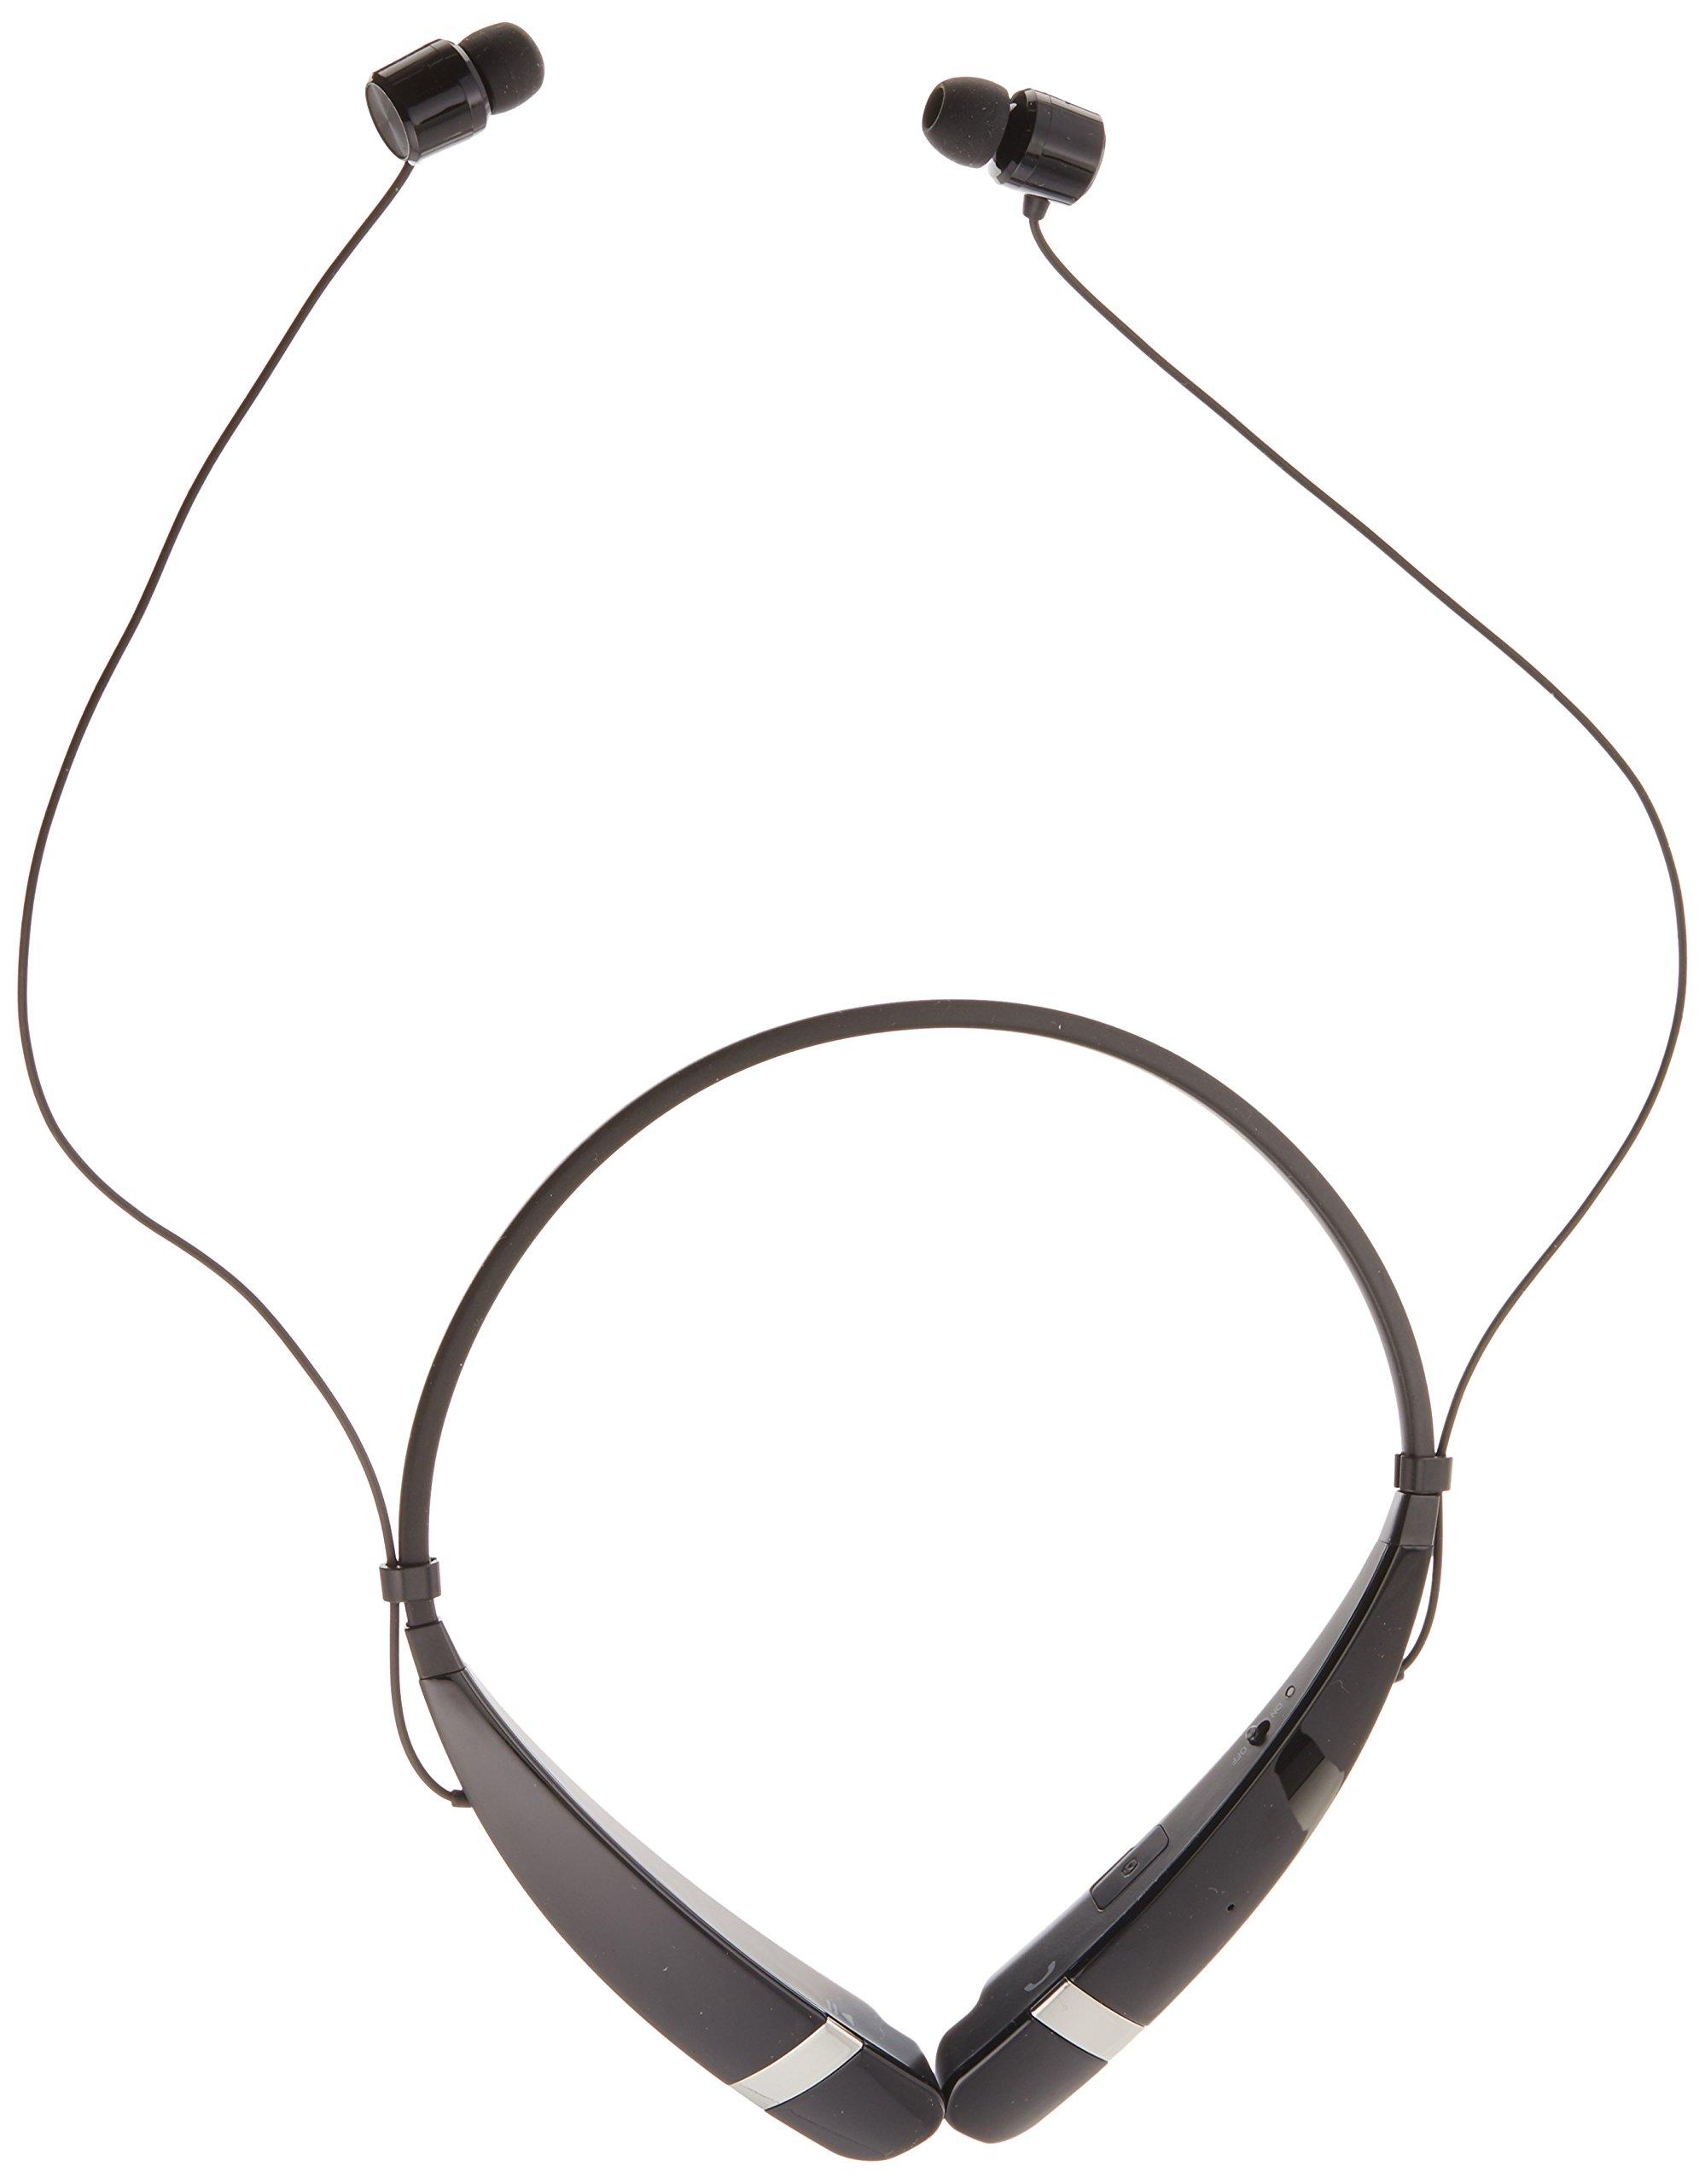 2109d8c5569 LG Tone Pro Wireless Stereo Bluetooth Black 760 - TechAdict